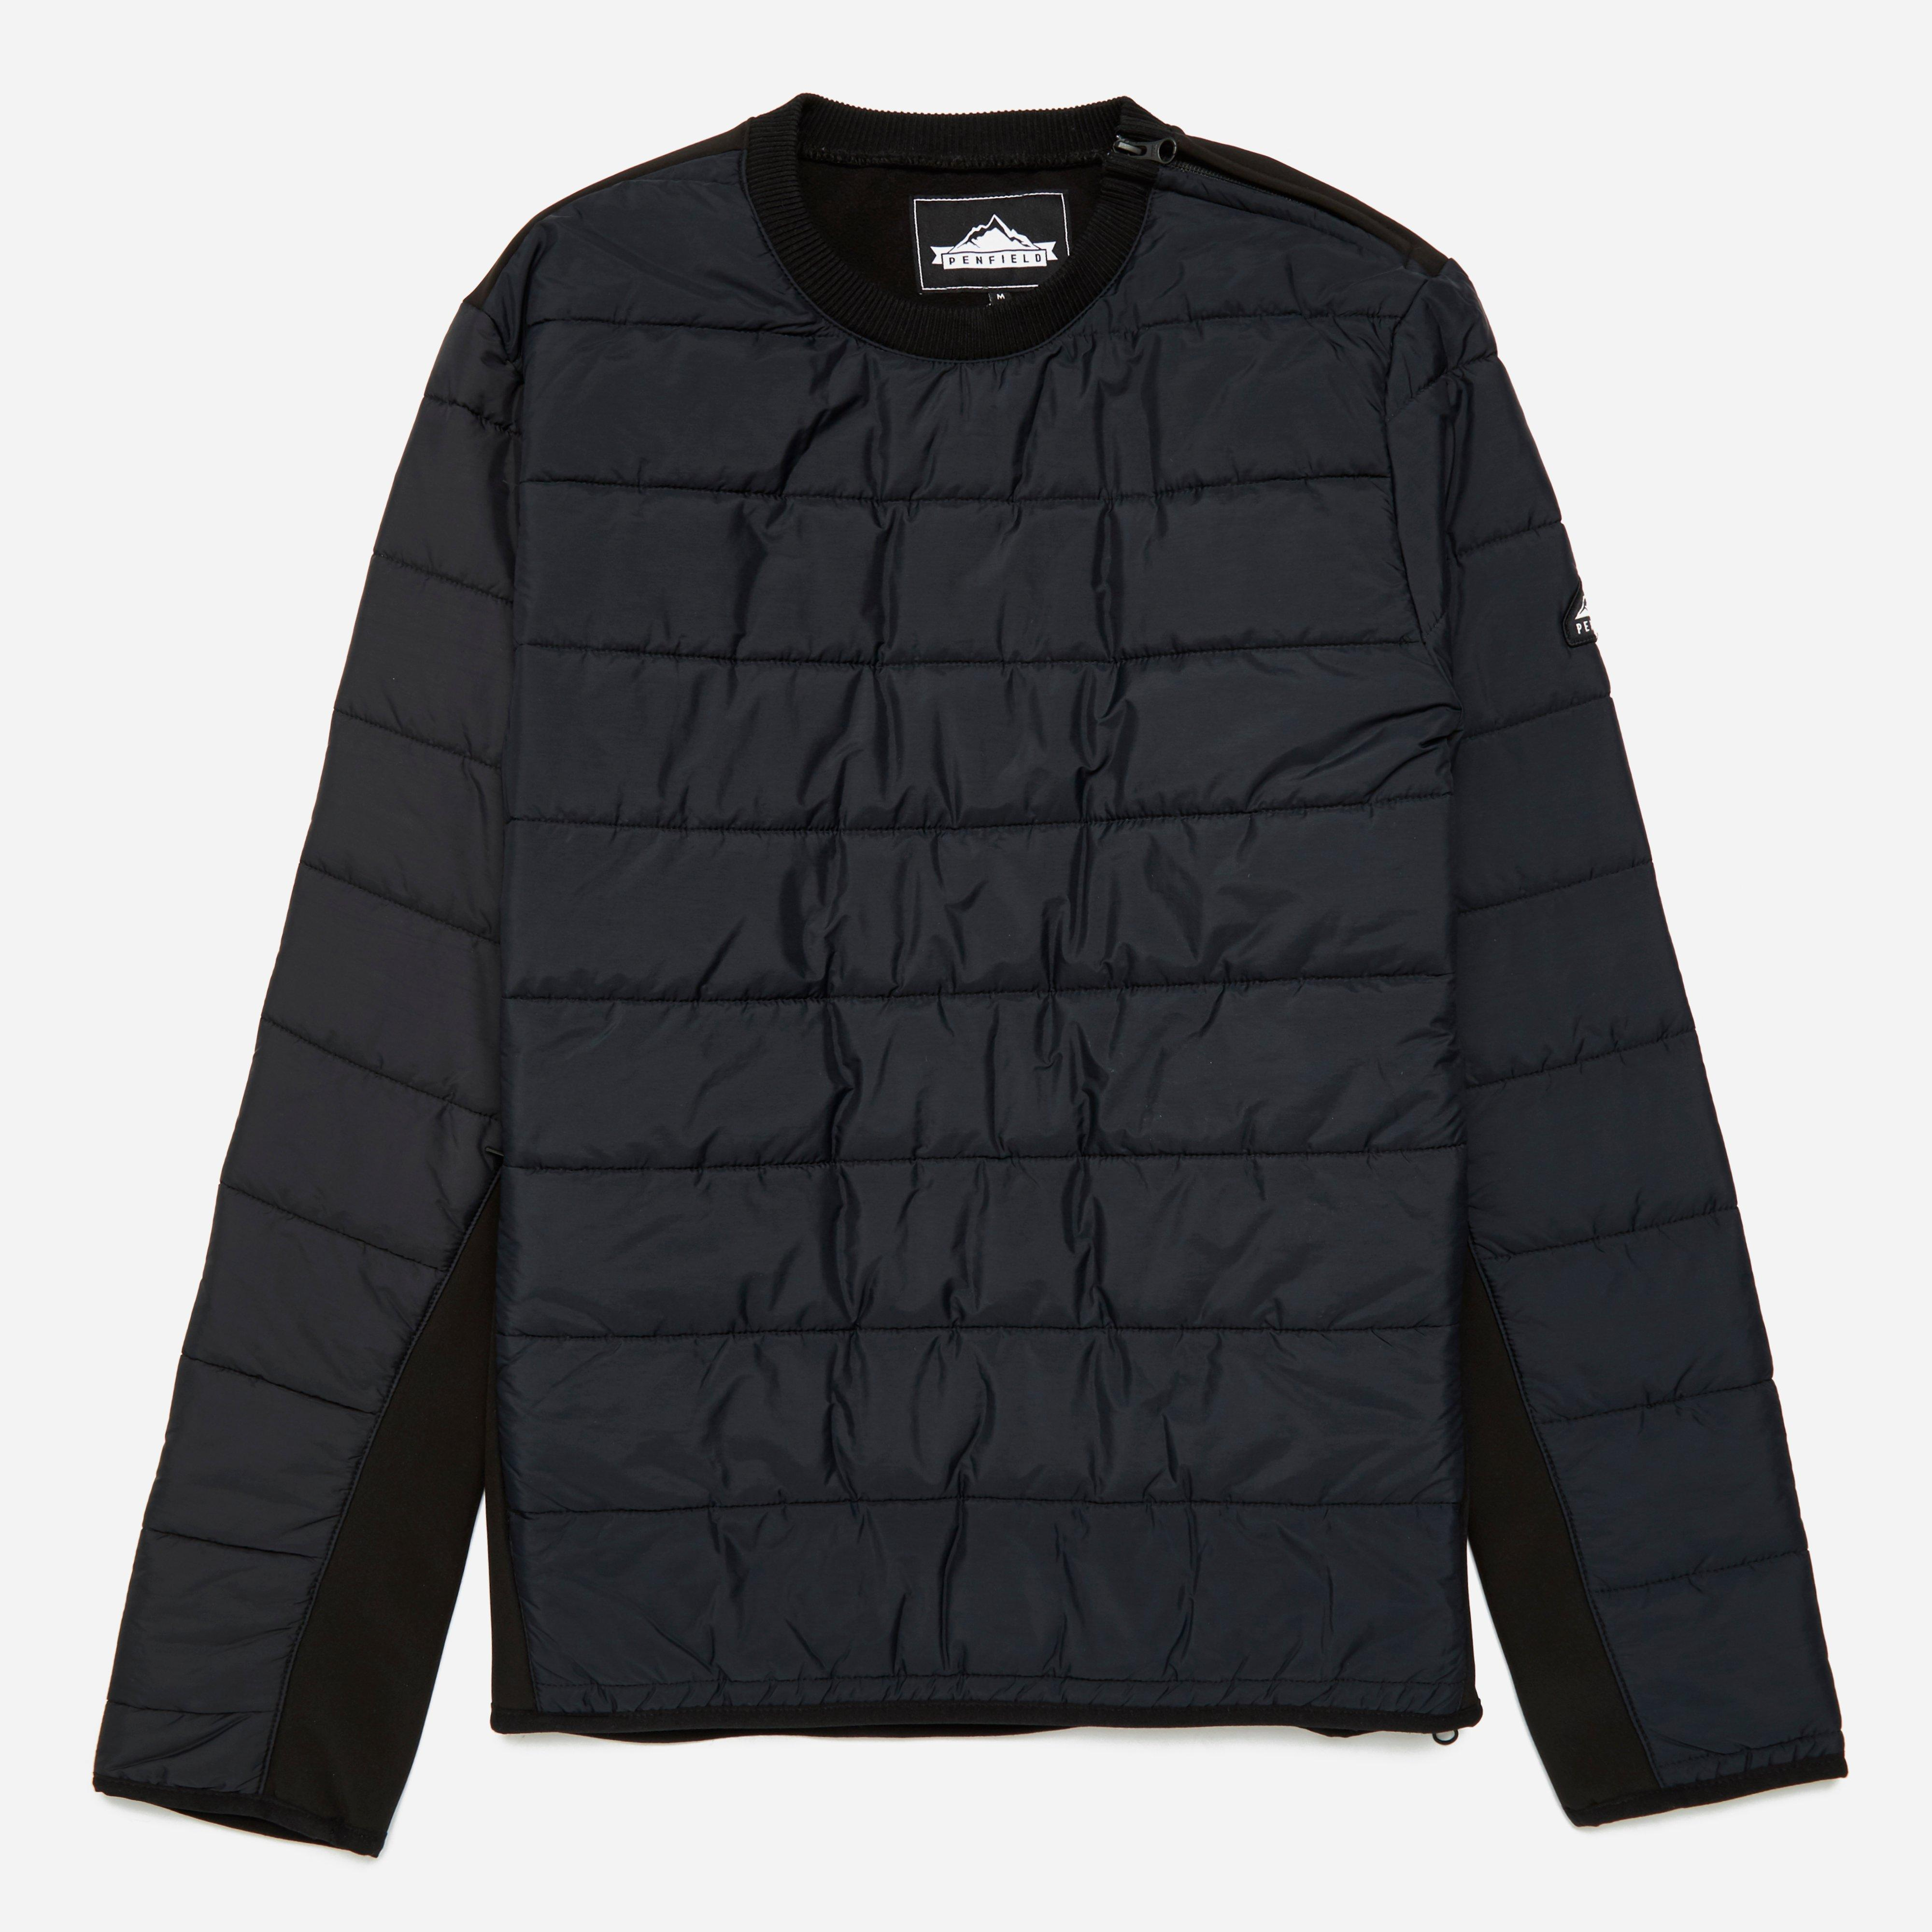 Penfield jackets uk sale